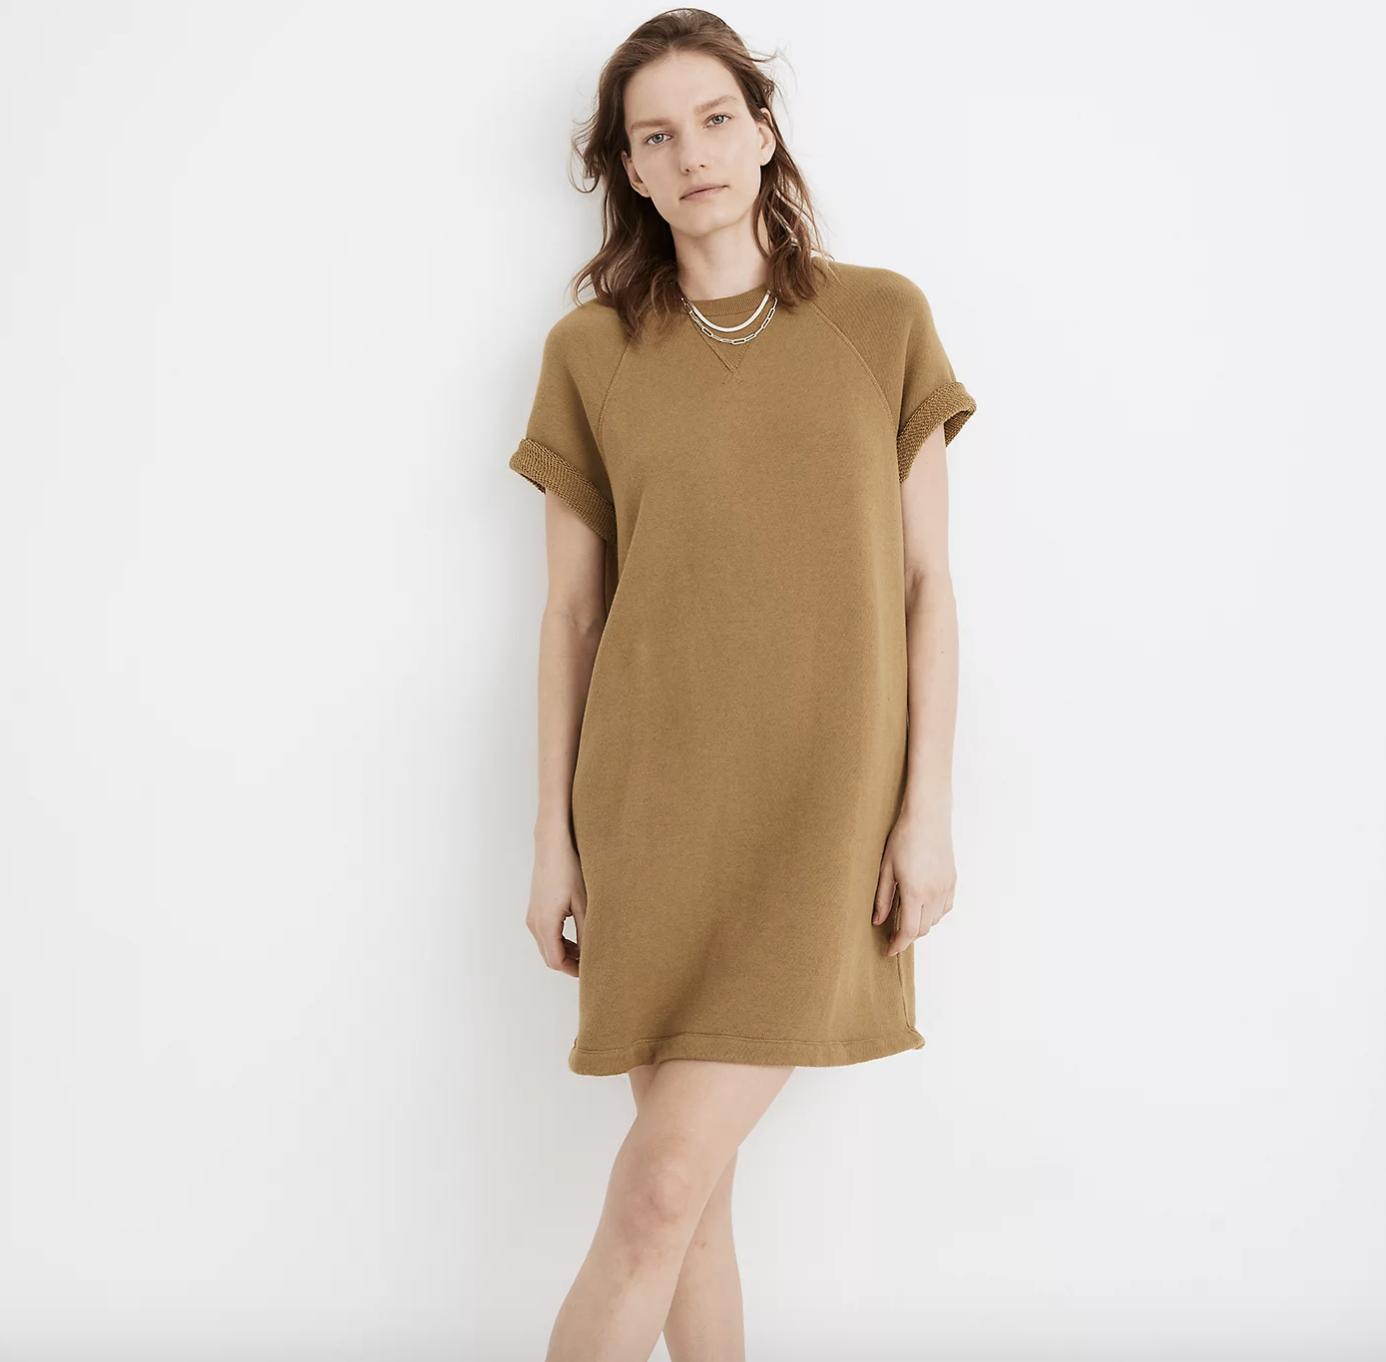 a model wearing the MWL Airyterry Sweatshirt Tee Dress in heather moss